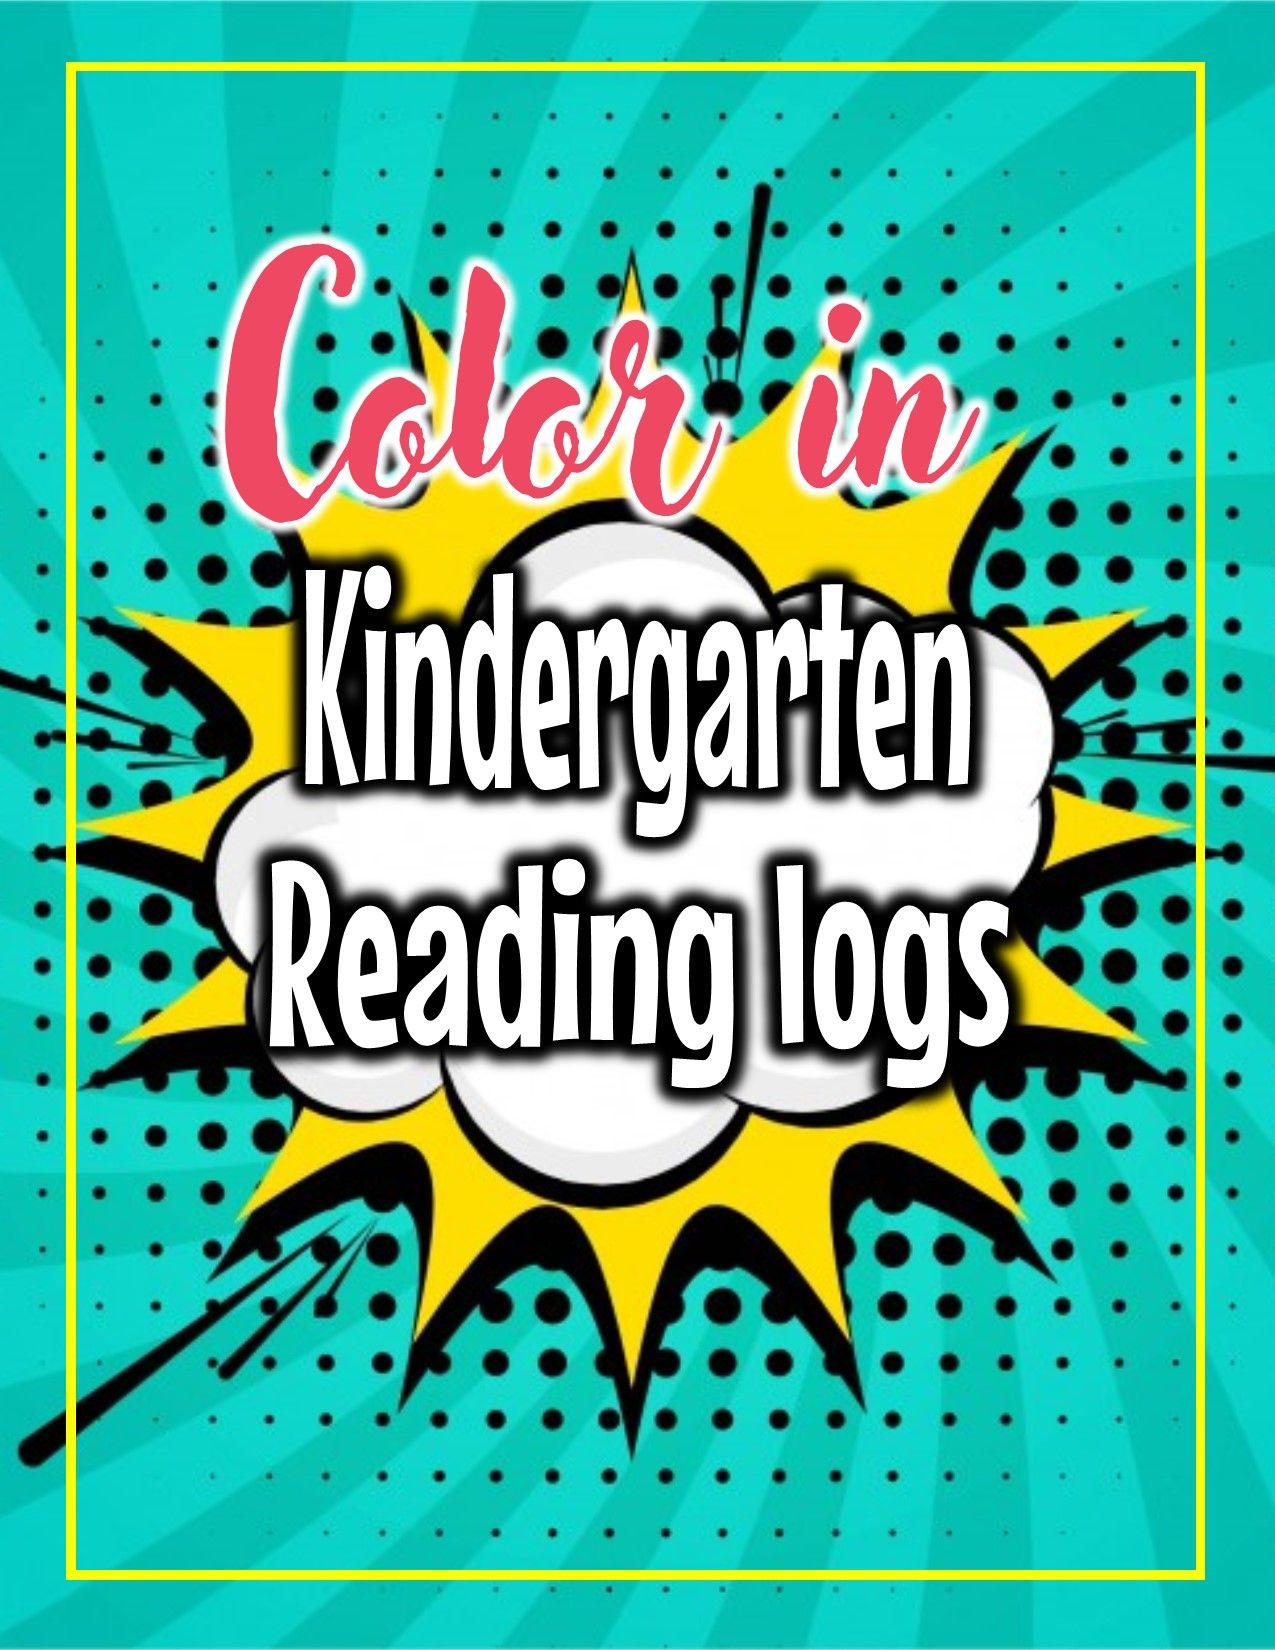 Read And Color Reading Logs Kindergarten Pre K